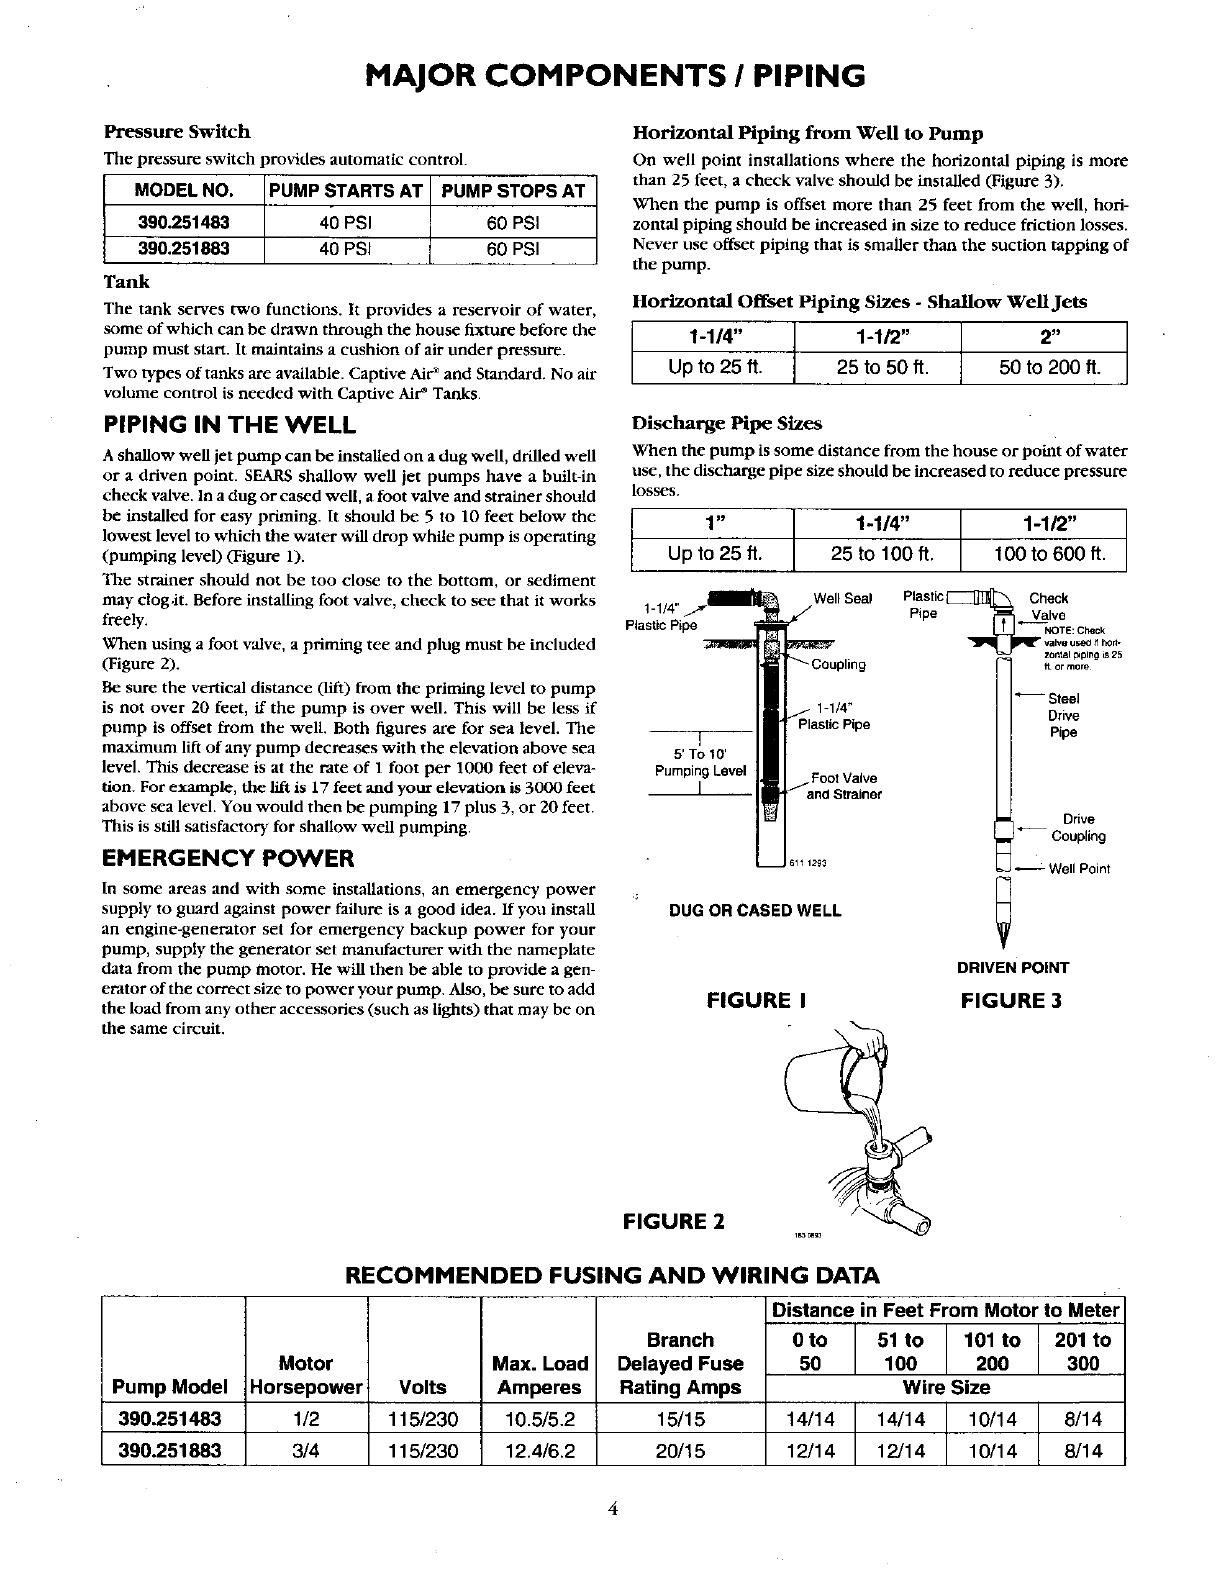 Outstanding wire gauge amps distance images wiring diagram ideas exelent wire gauge distance calculator ensign wiring standart keyboard keysfo Gallery